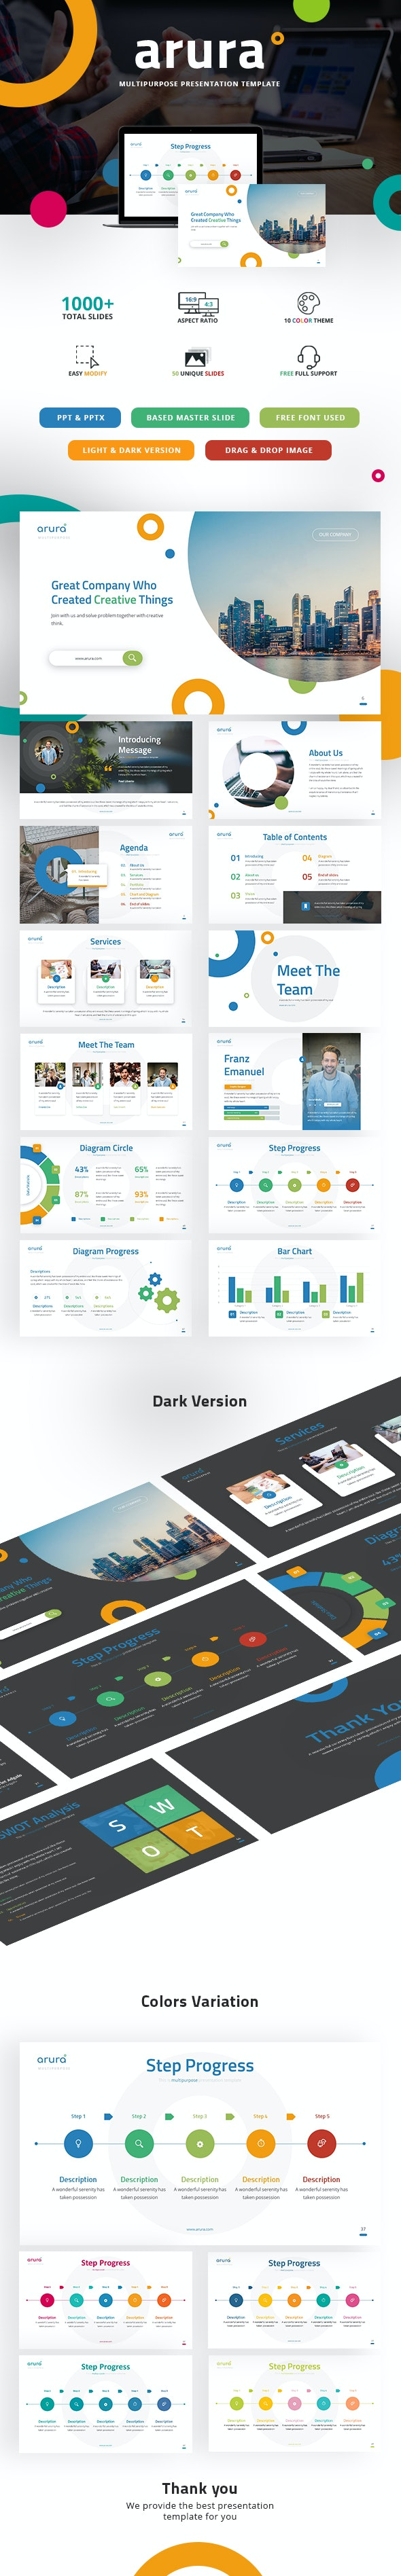 Arura Multipurpose PowerPoint Presentation - PowerPoint Templates Presentation Templates